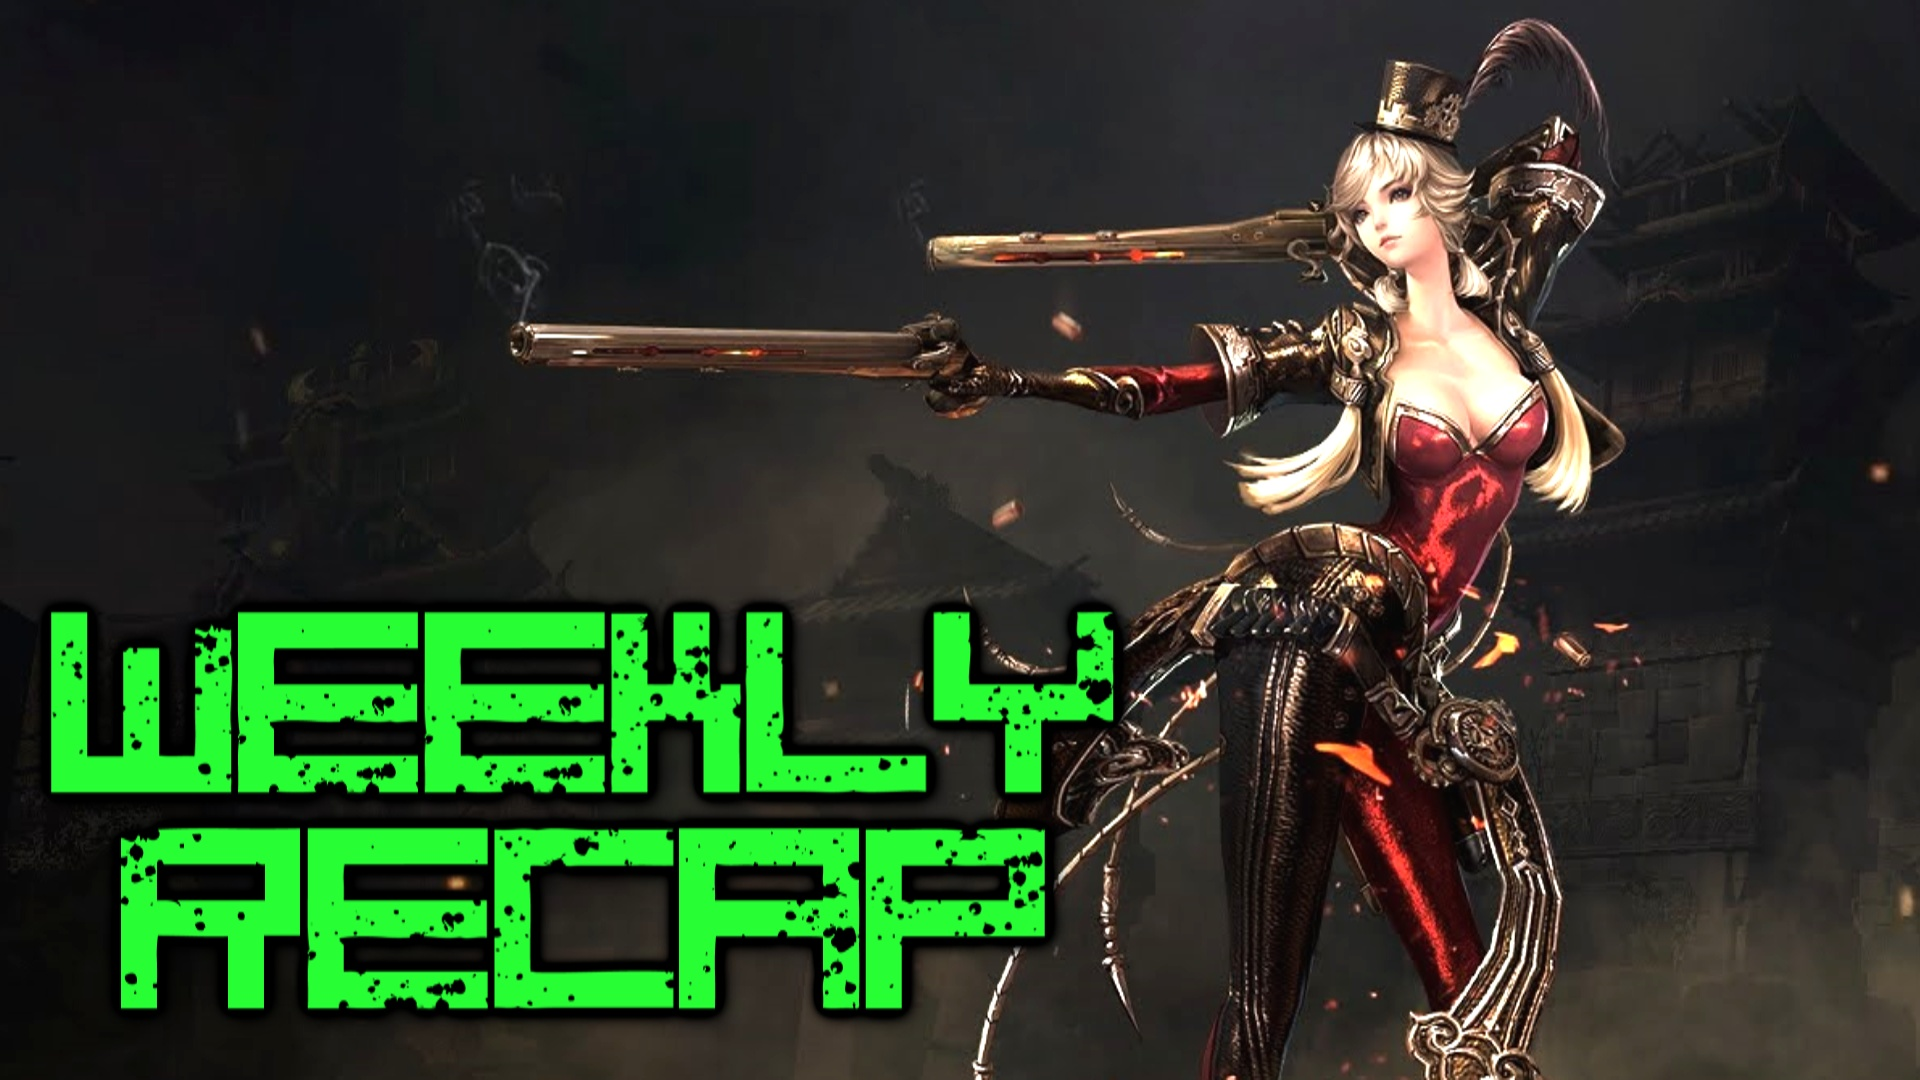 MMOHuts Weekly Recap #293 June 6th - Swordsman, Skyforge, Revelation & More!